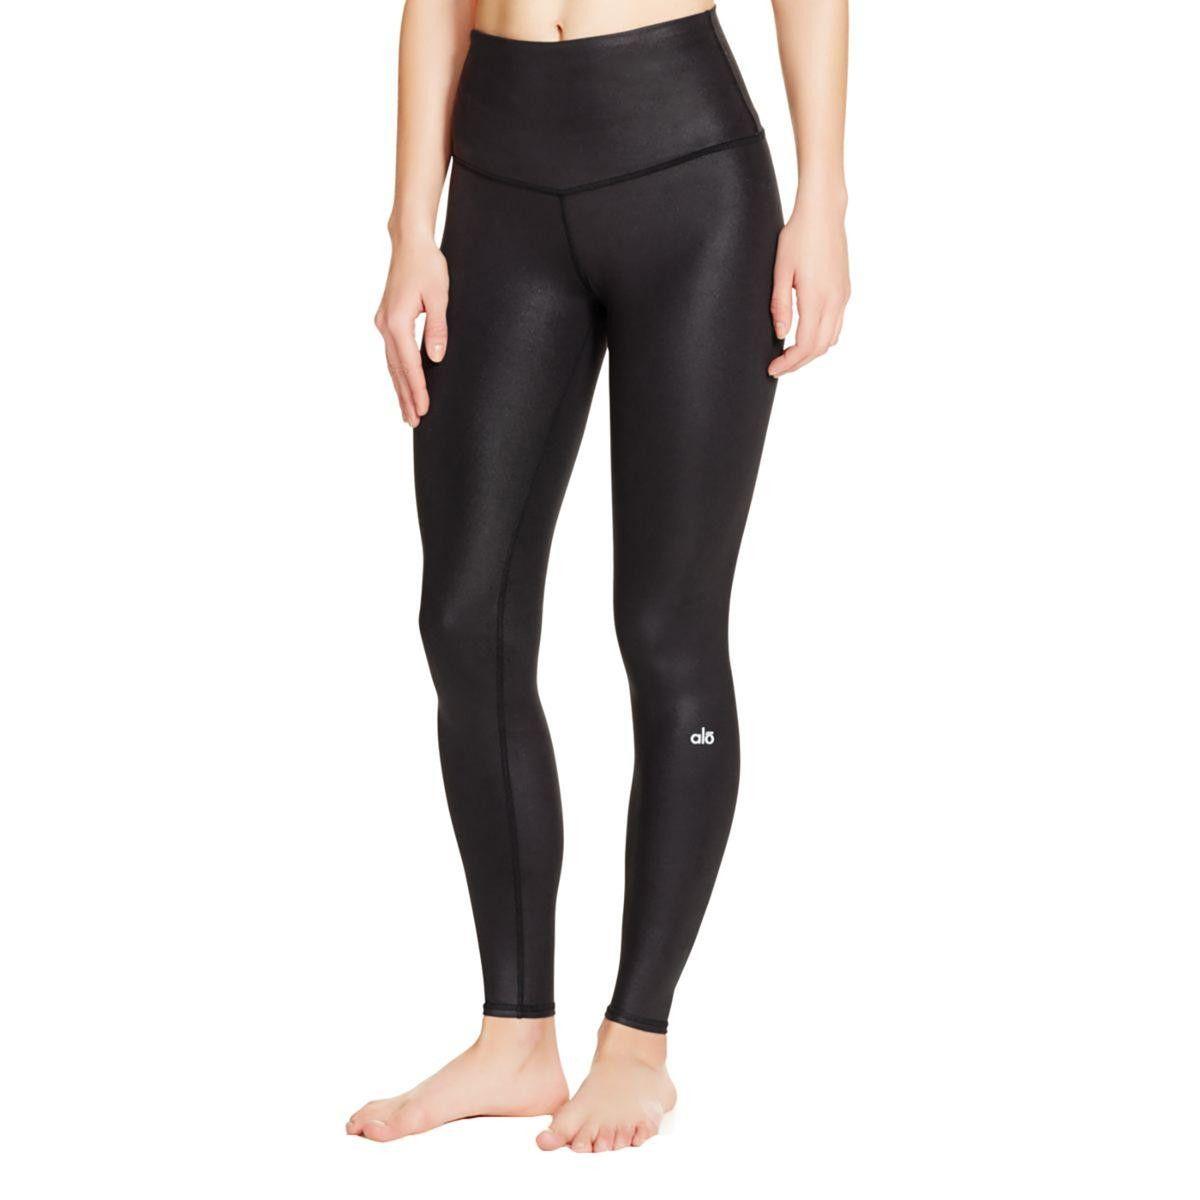 Alo Womens Shimmer High Waist Yoga Pants